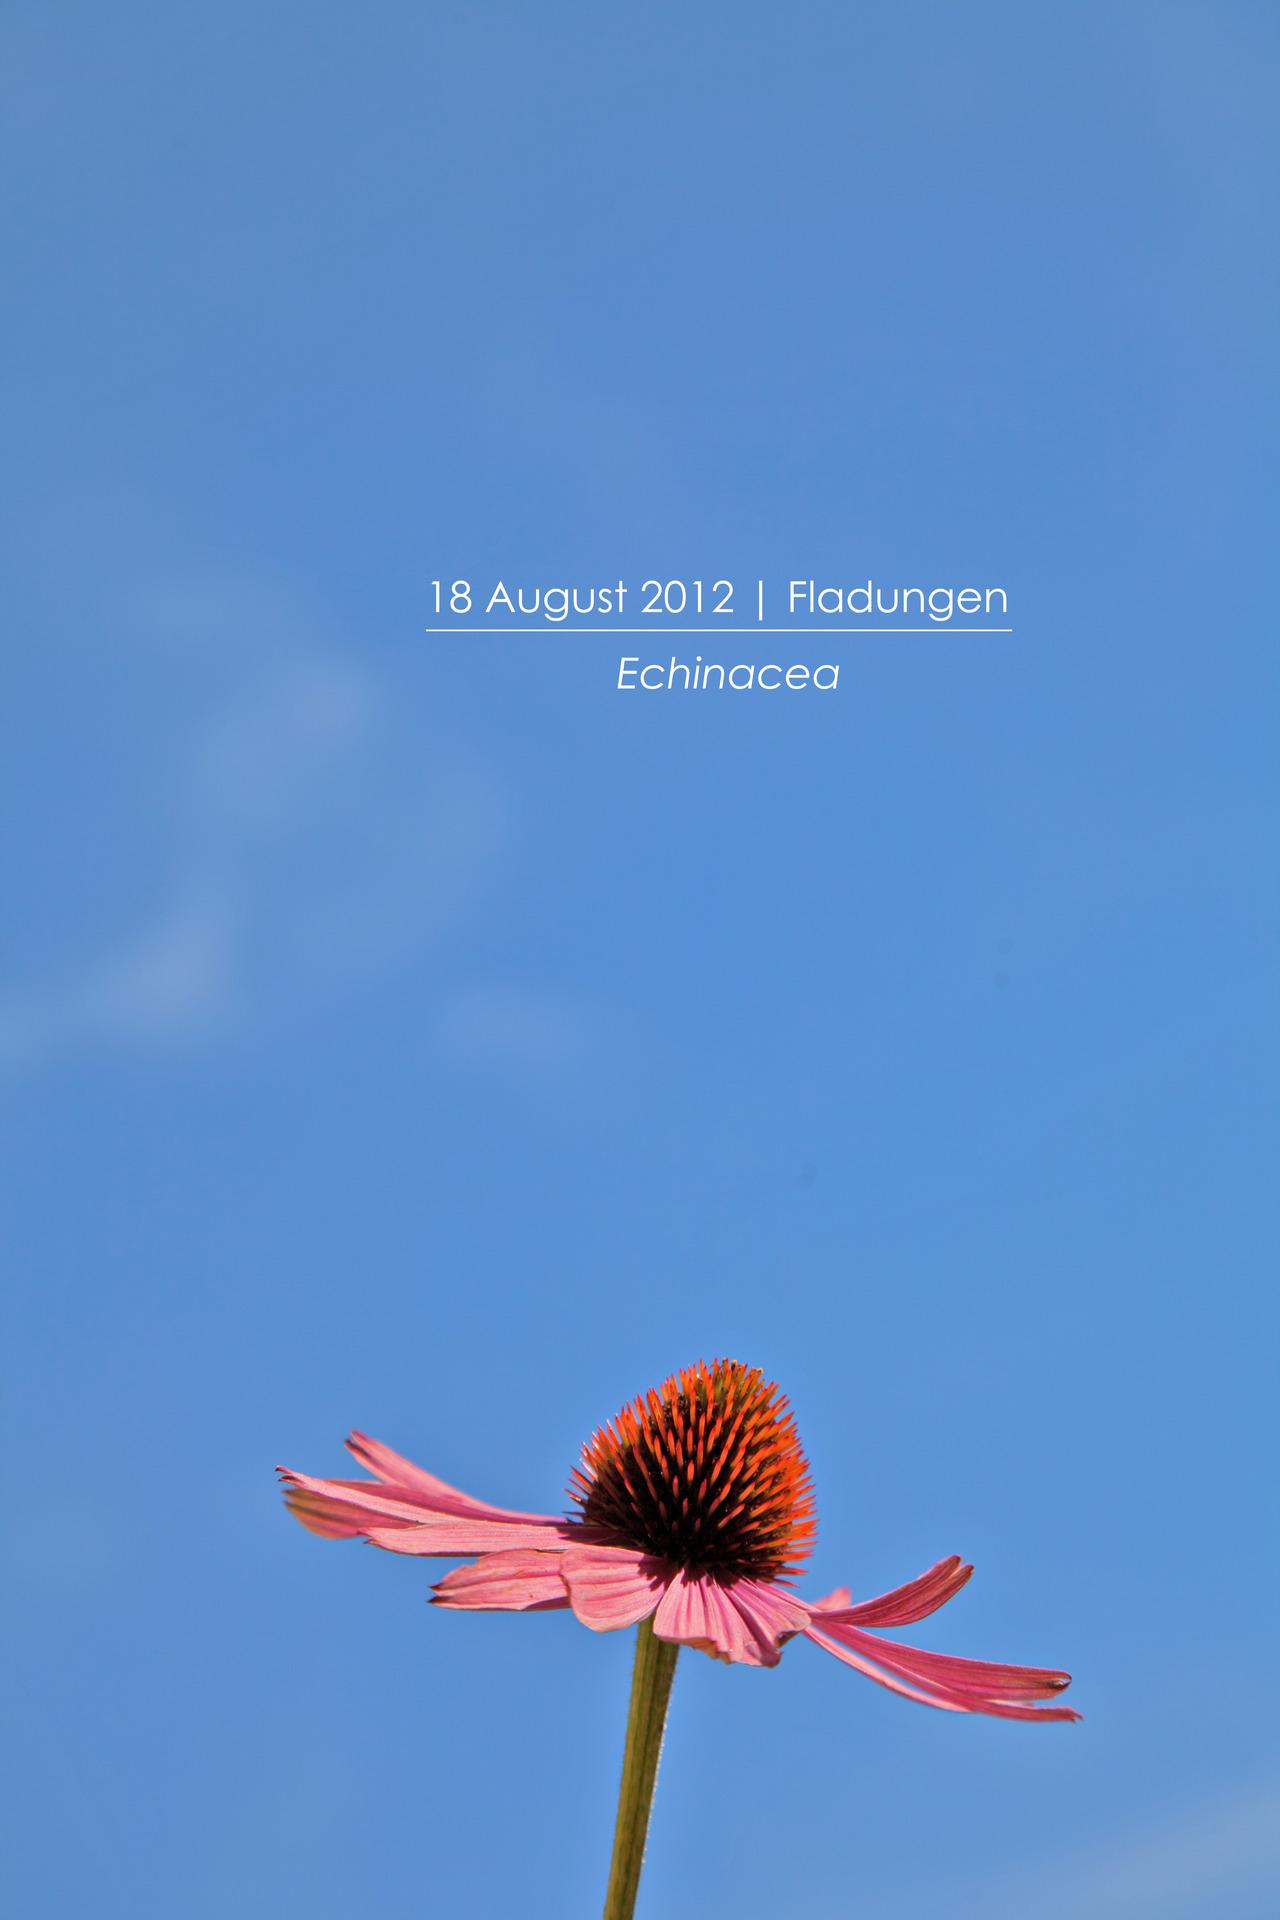 p366, take 321: Echinacea